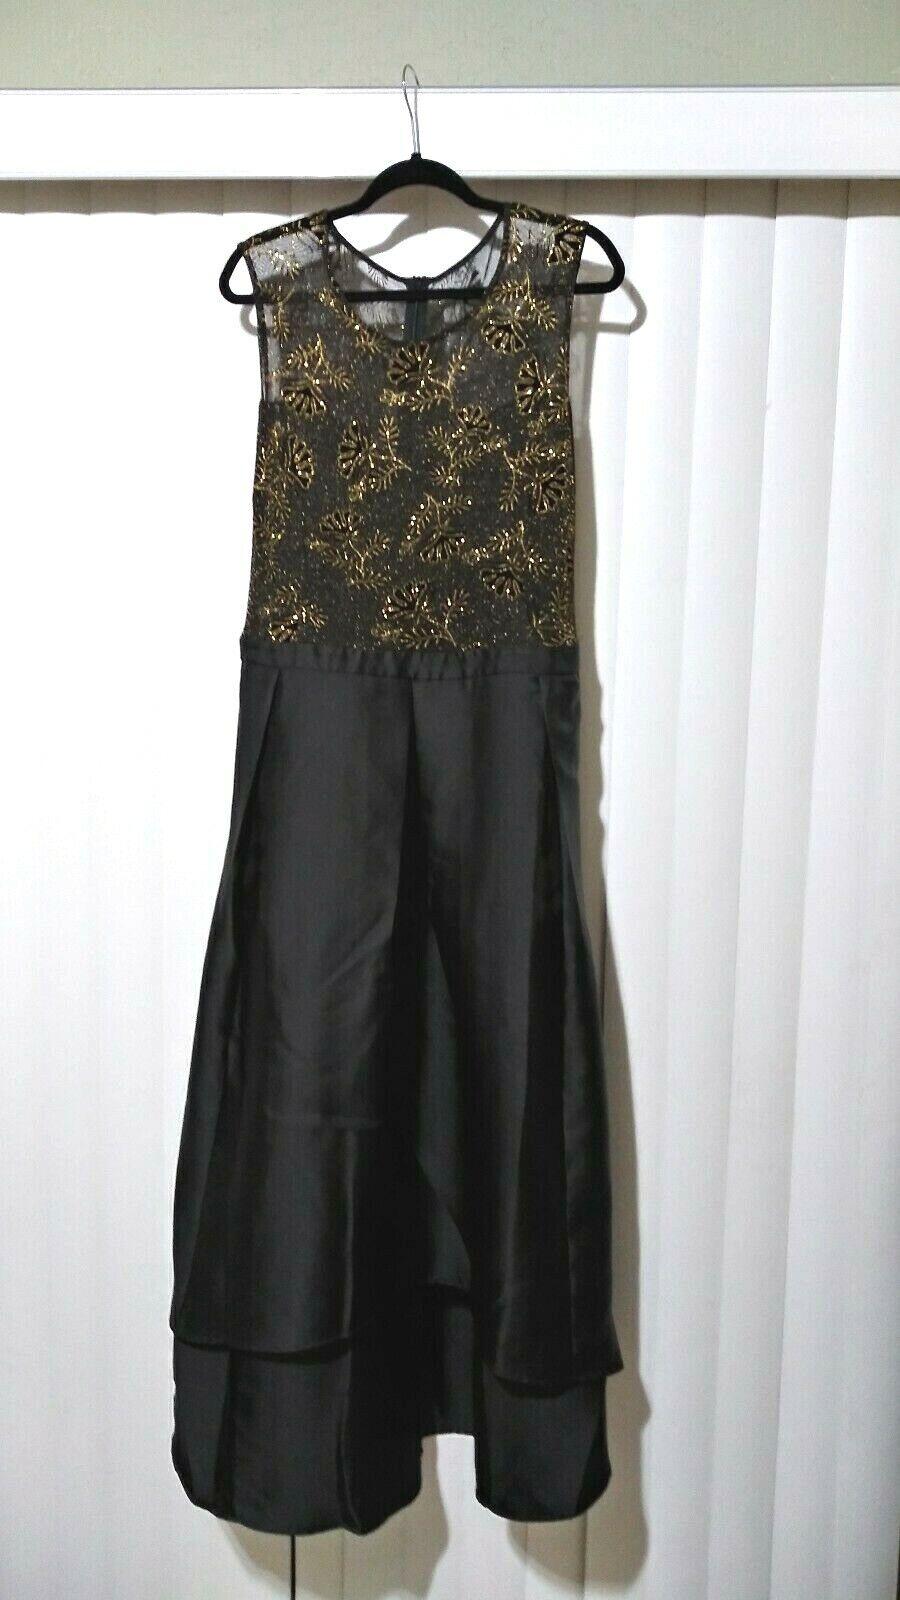 CANDALITE Woherren Größe 3X Formal Gown Sleeveless schwarz Gold Asymmetrical Hem NWT